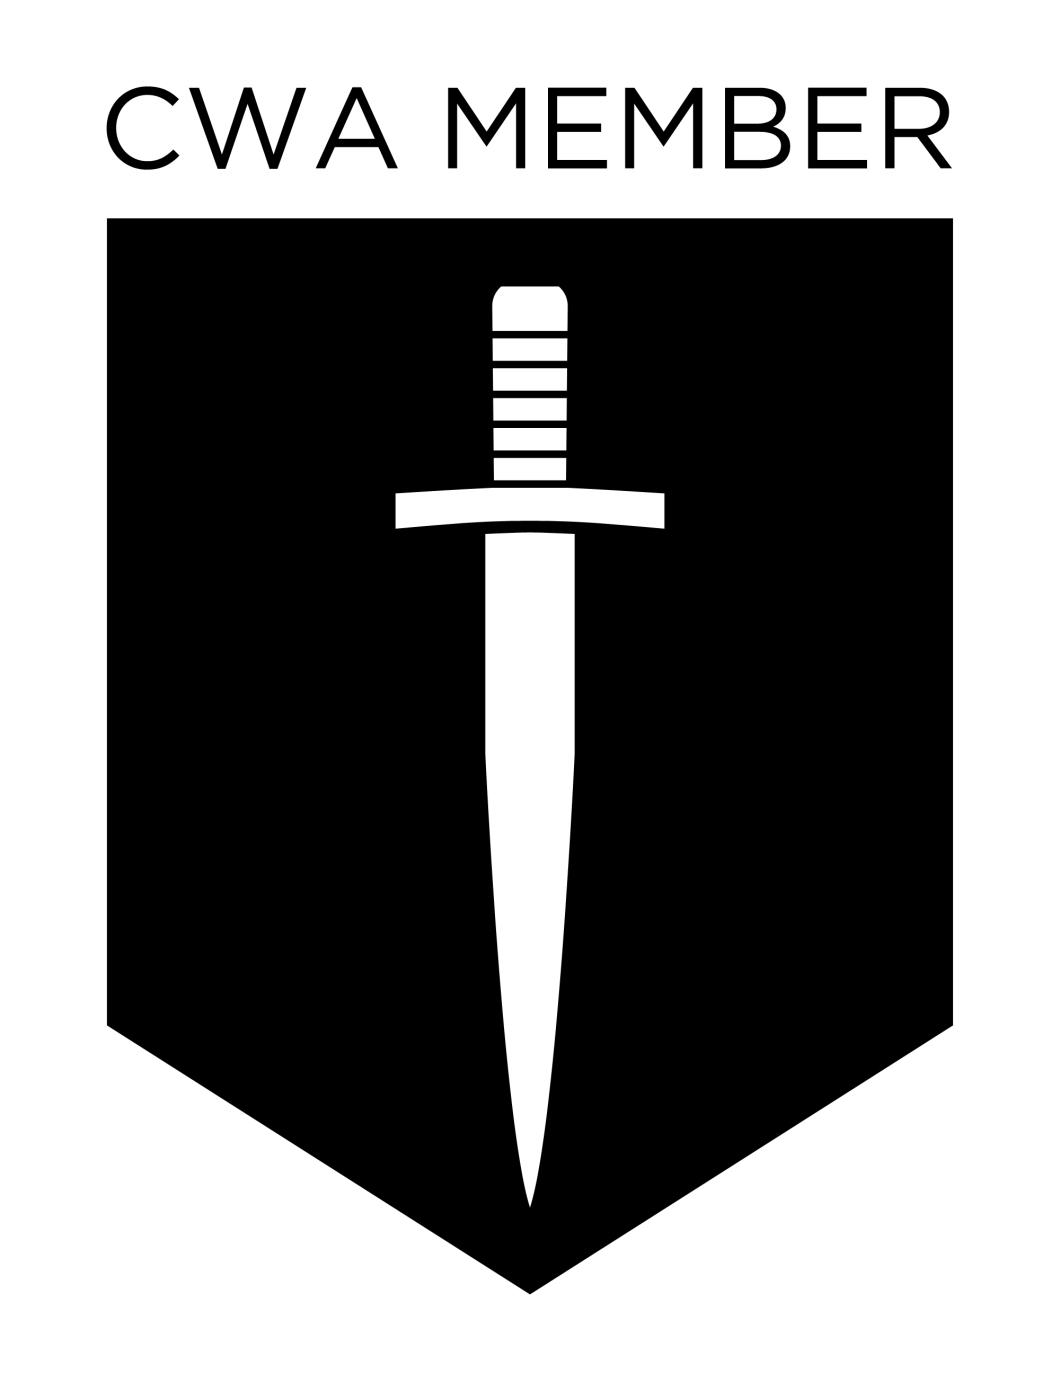 CWA-member-logo-2018